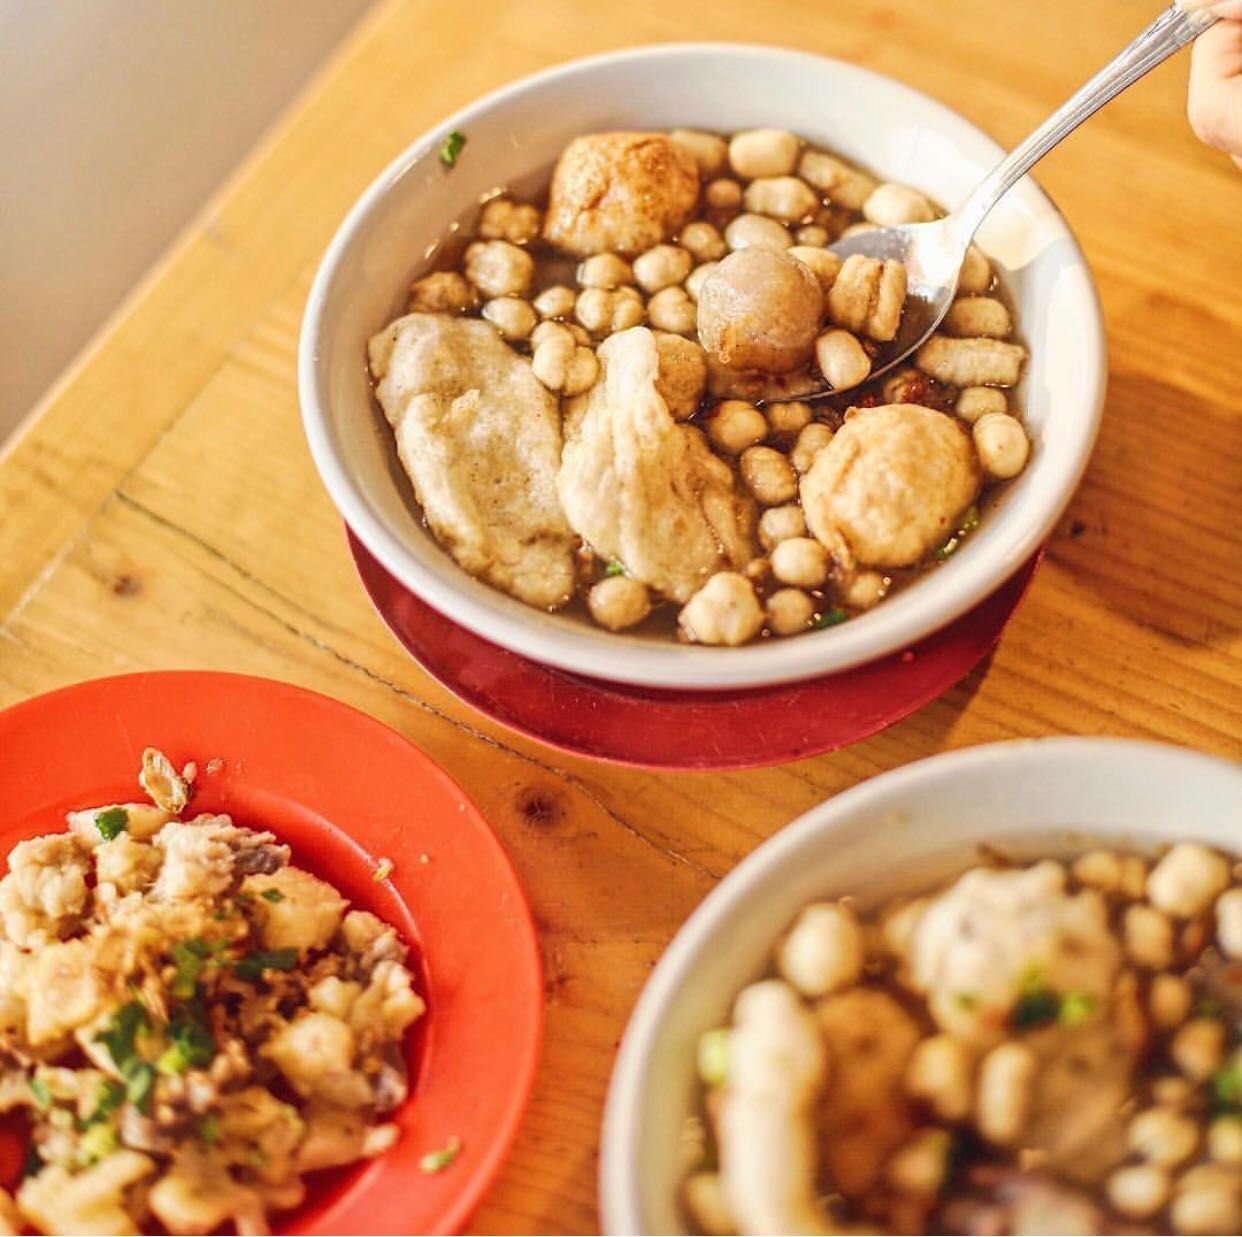 Daftar Delivery Makanan Bandung Terbaru Desember 2019 Gofood